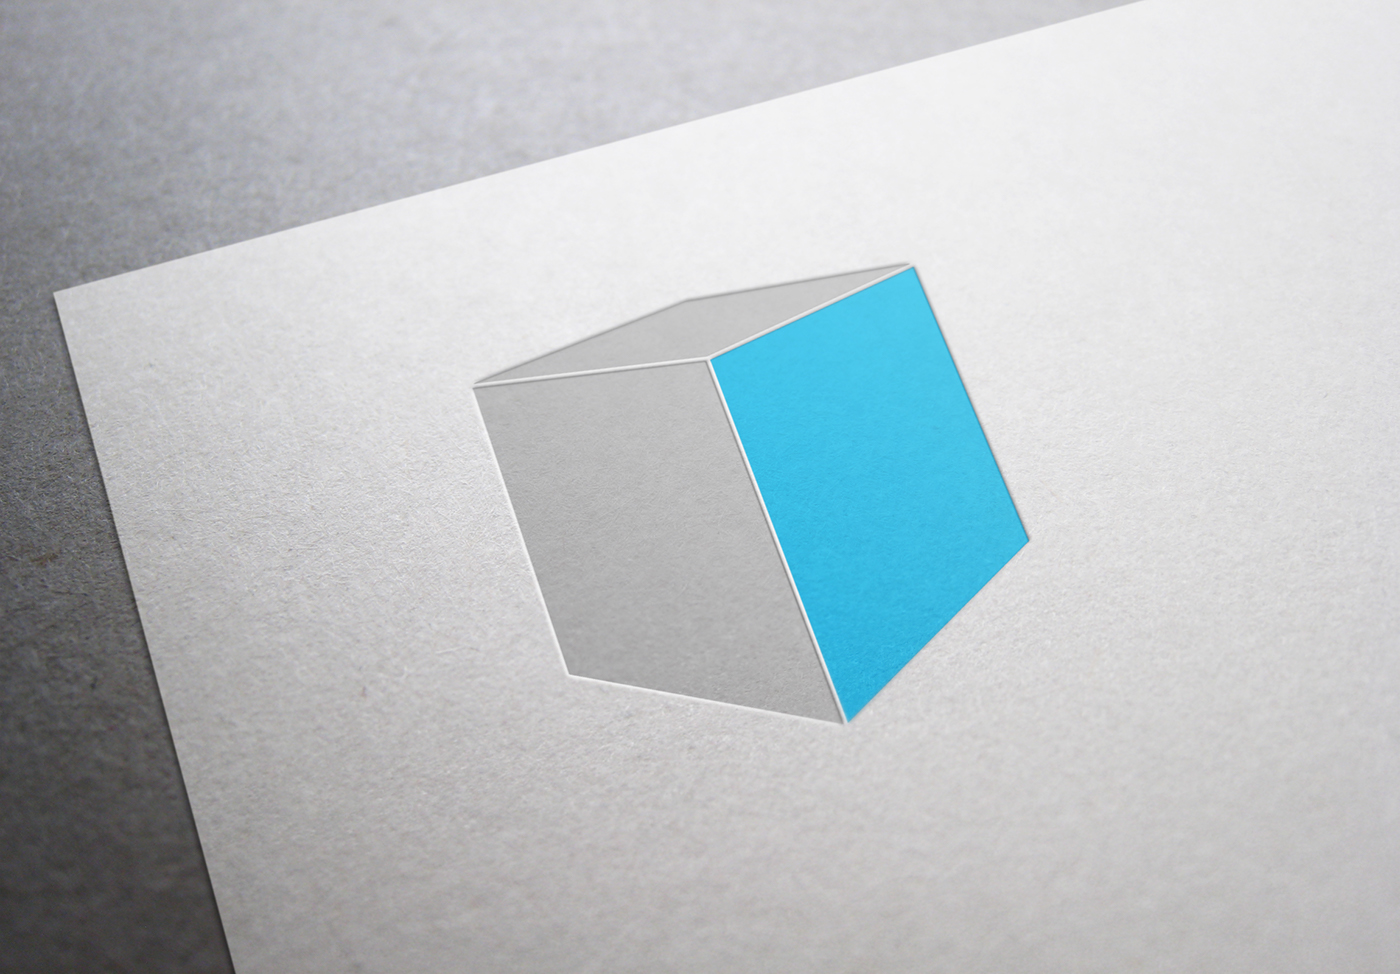 creative box logo design on behance. Black Bedroom Furniture Sets. Home Design Ideas